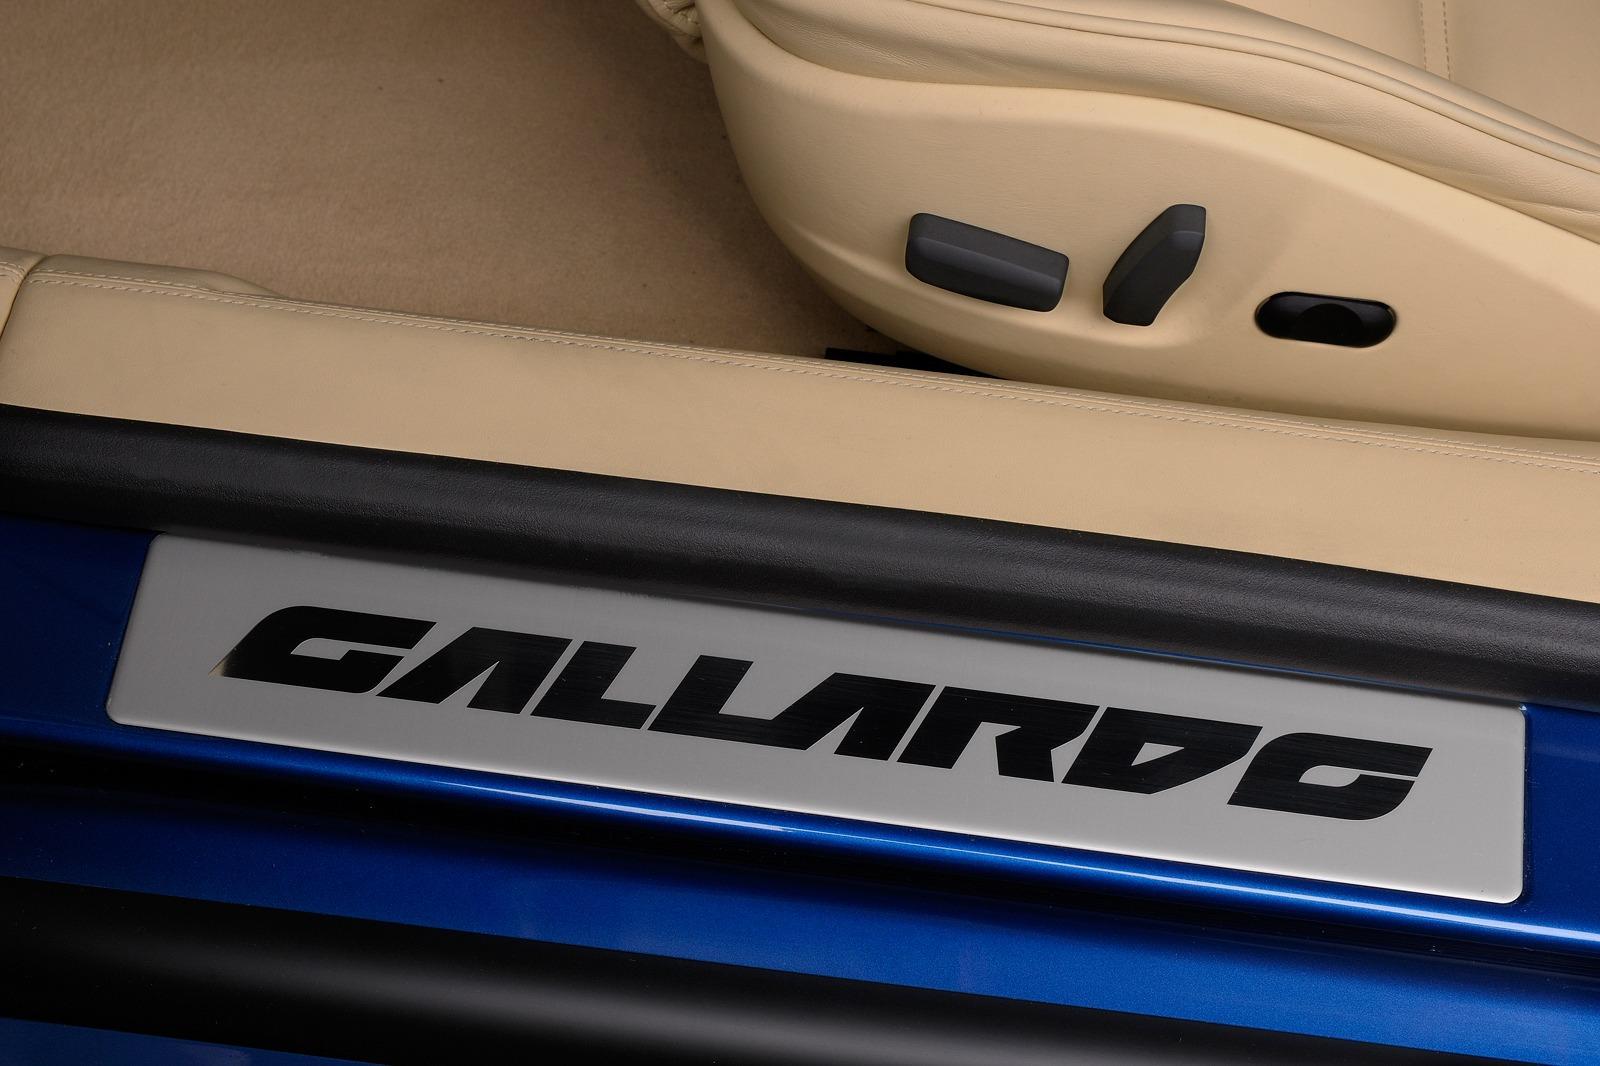 2012 Lamborghini Gallardo LP550-2 Spyder - фотография №7